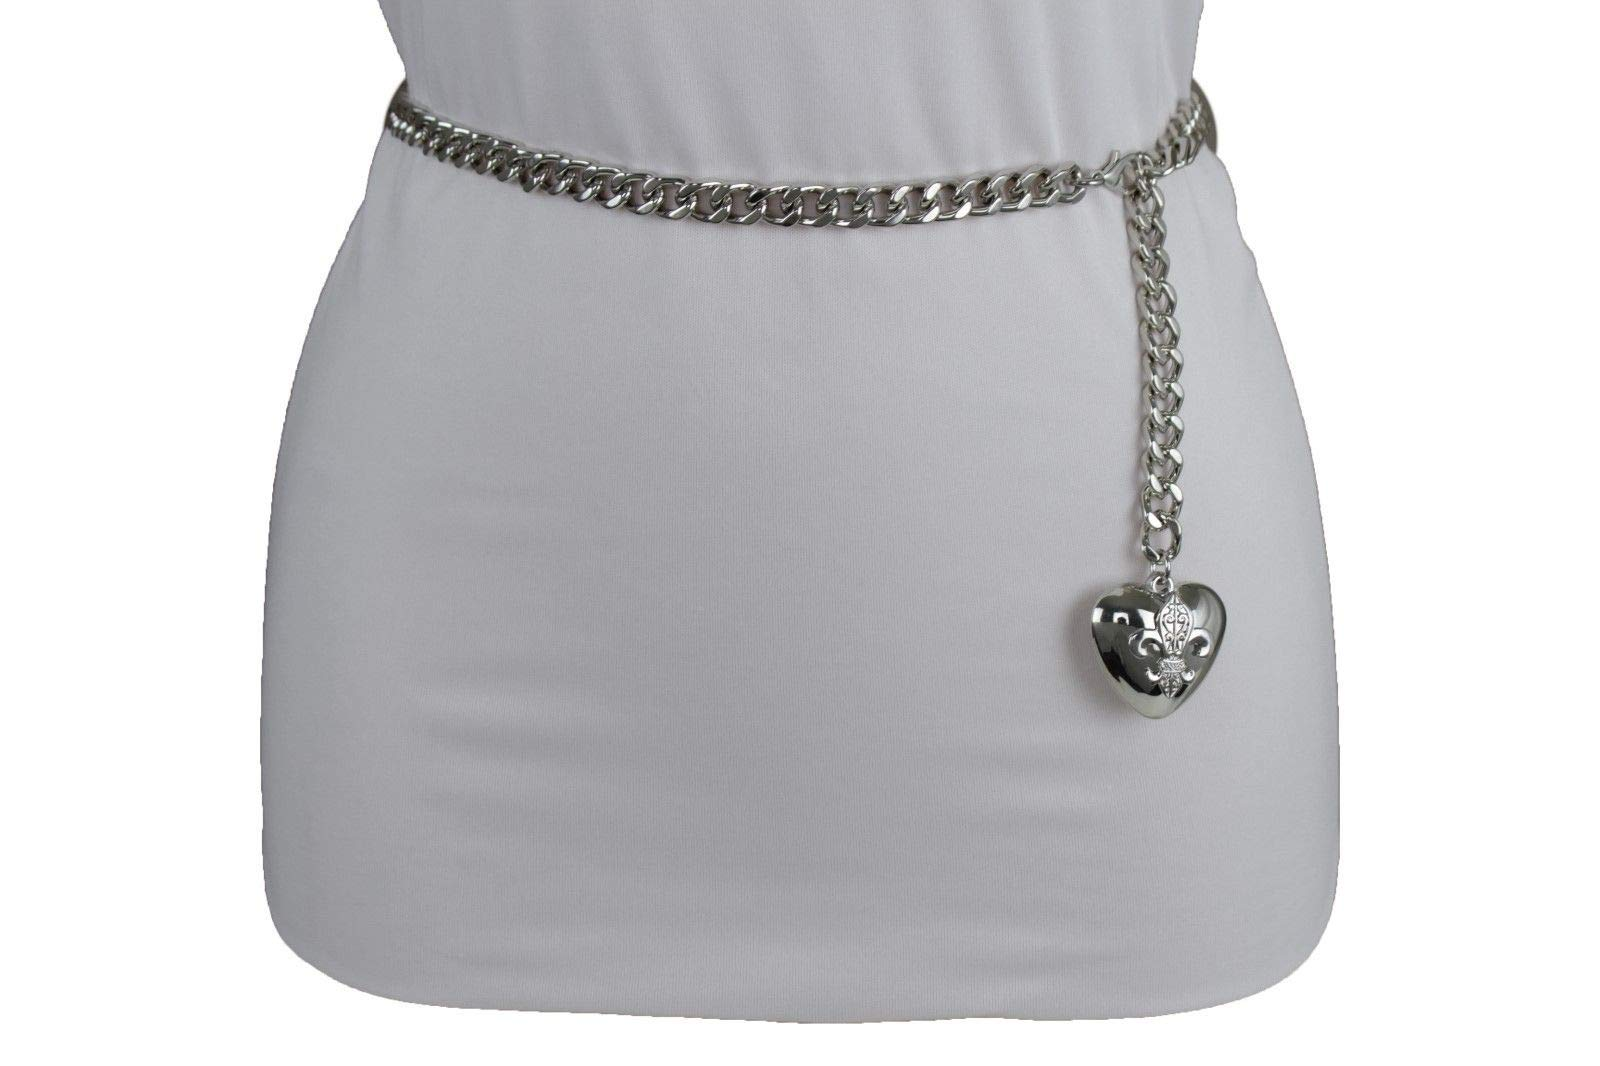 Women Hip Waist Silver Metal Chain Fashion Belt Love Heart Buckle Charm XS S M by RIX Fashion Luxury (Image #5)